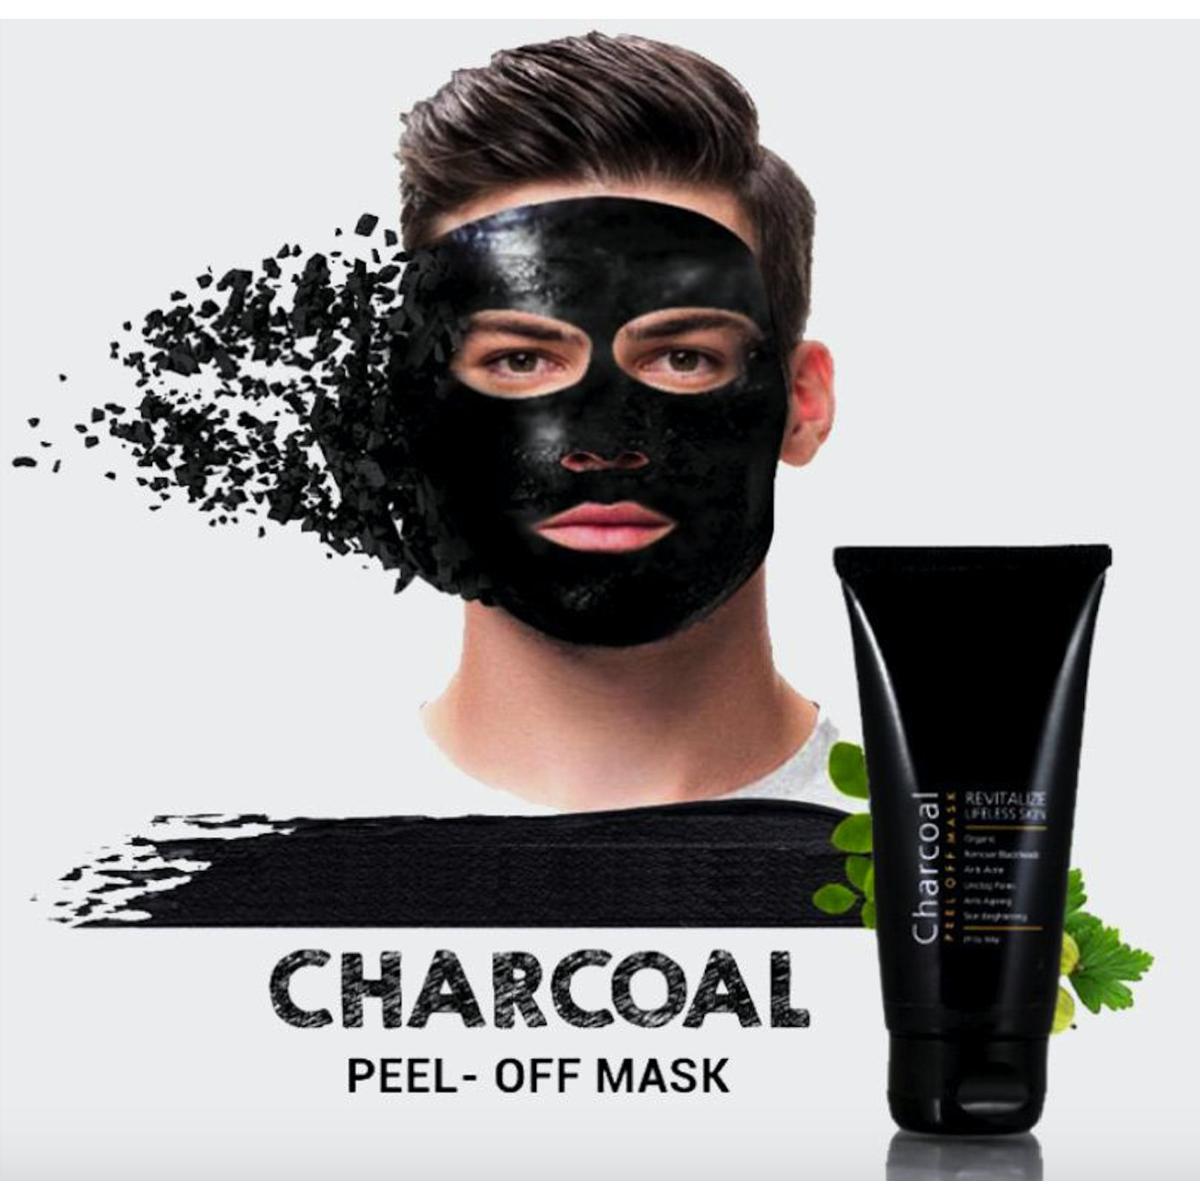 Pore Cleansing Face Mask for Men and Women - Vegan, Natural Ingredients